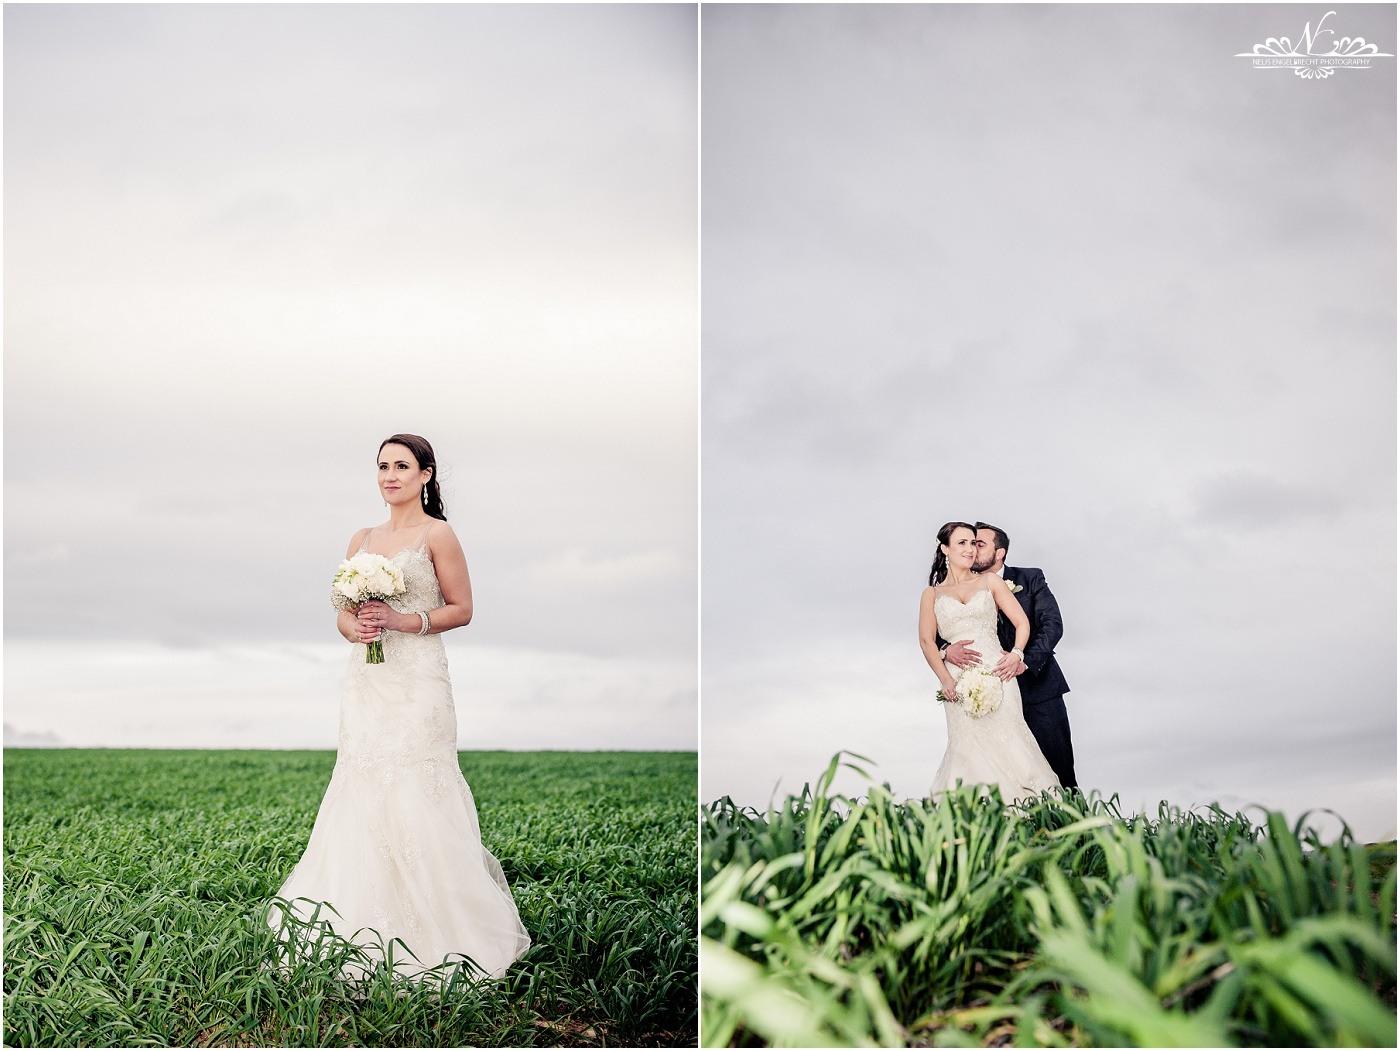 Eensgezind-Wedding-Photos-Nelis-Engelbrecht-Photography-117